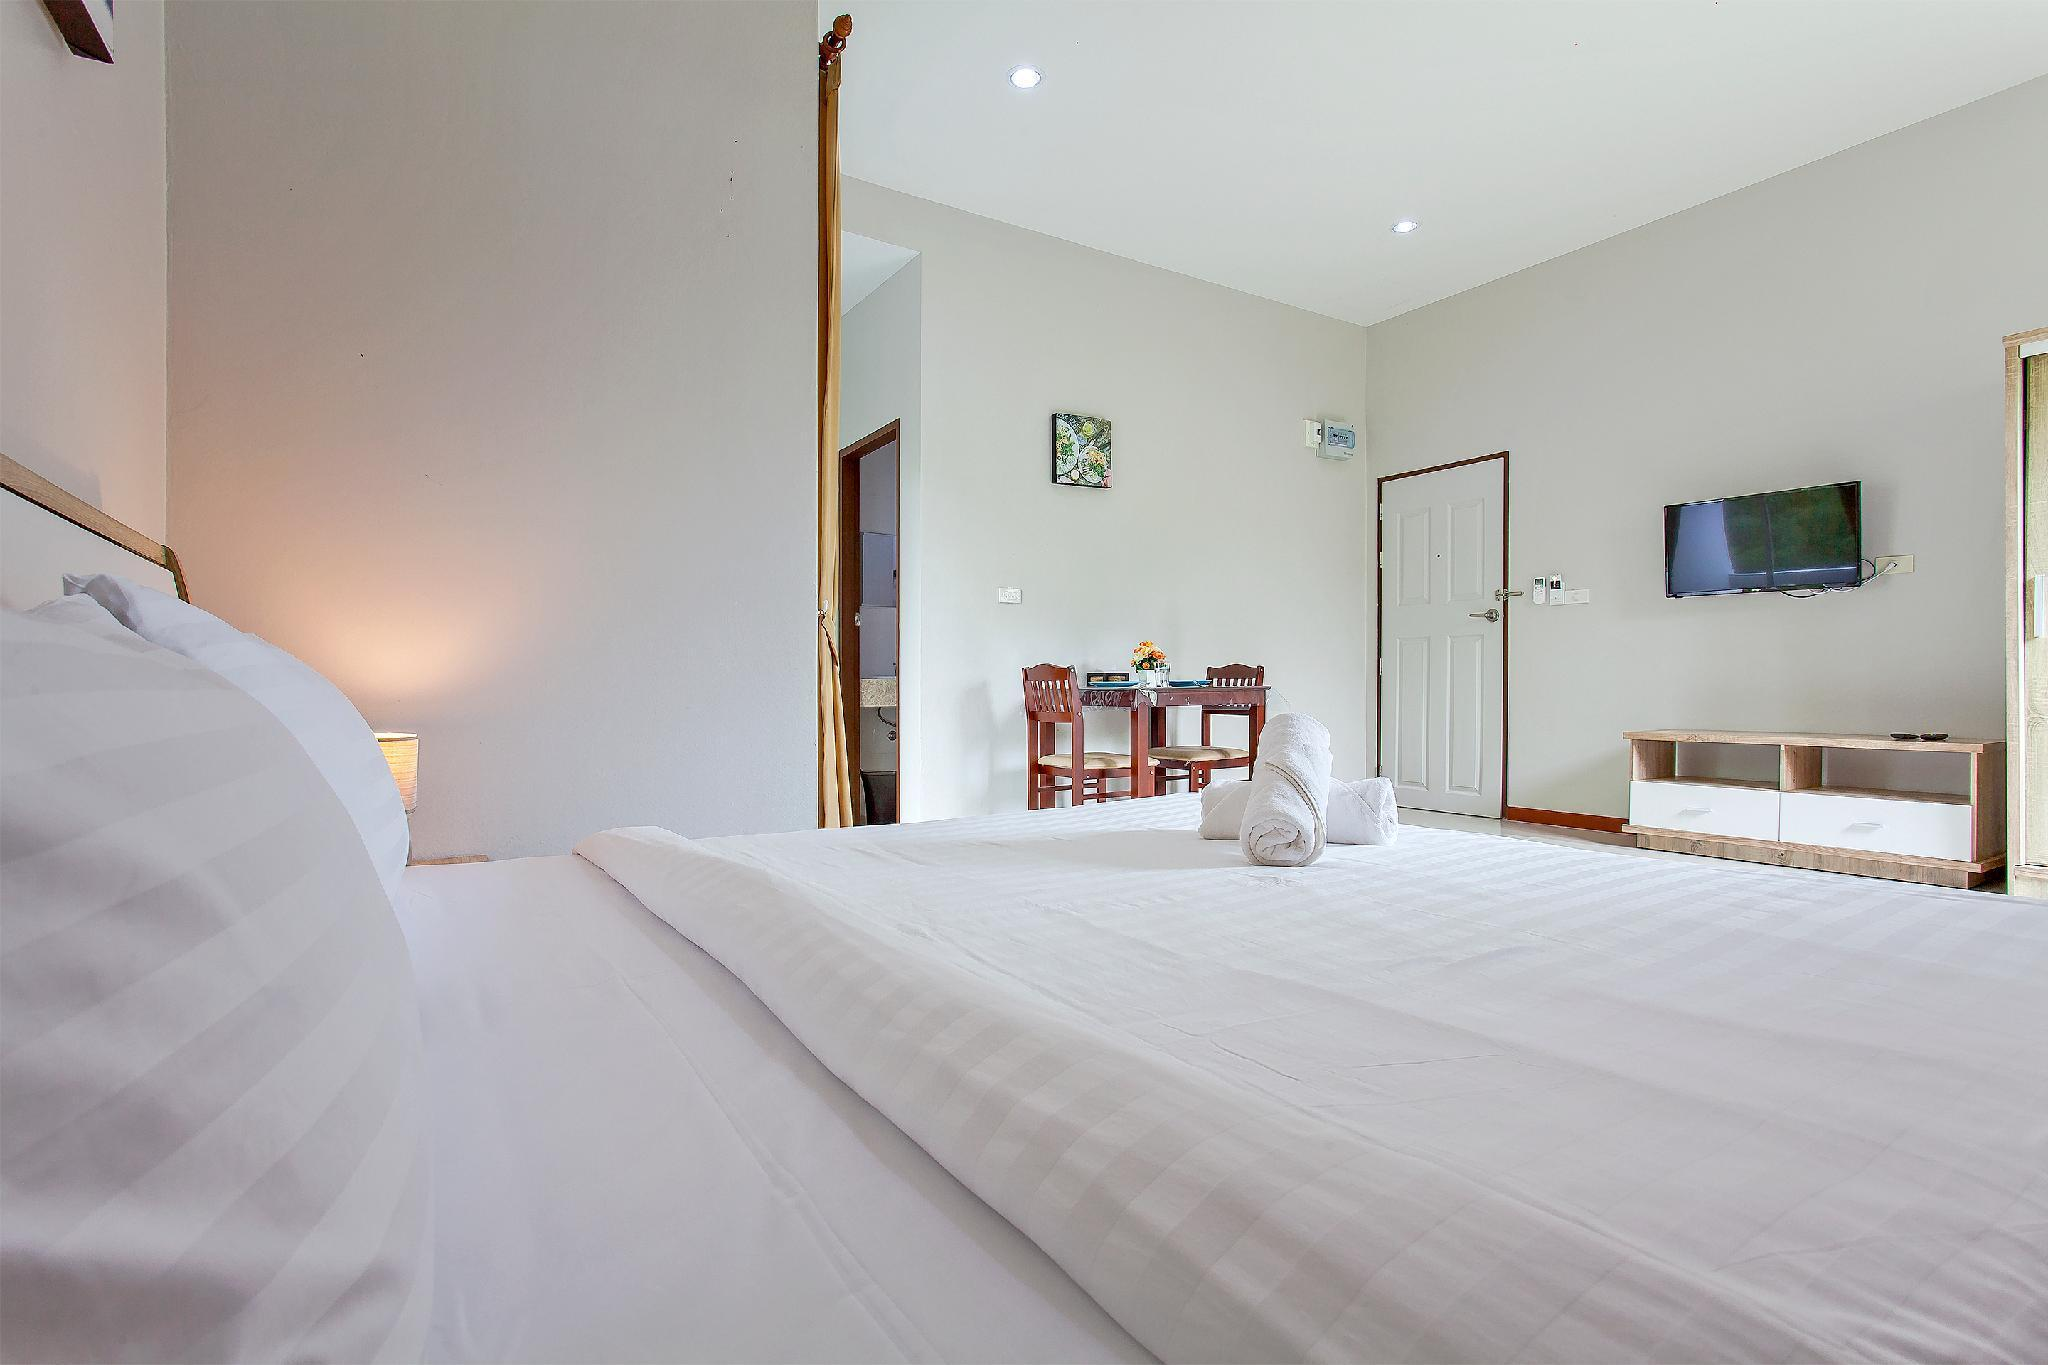 ⭐The White Wooden Resort 18BR w/Pool Near Beach วิลลา 18 ห้องนอน 18 ห้องน้ำส่วนตัว ขนาด 4800 ตร.ม. – ไม้ขาว